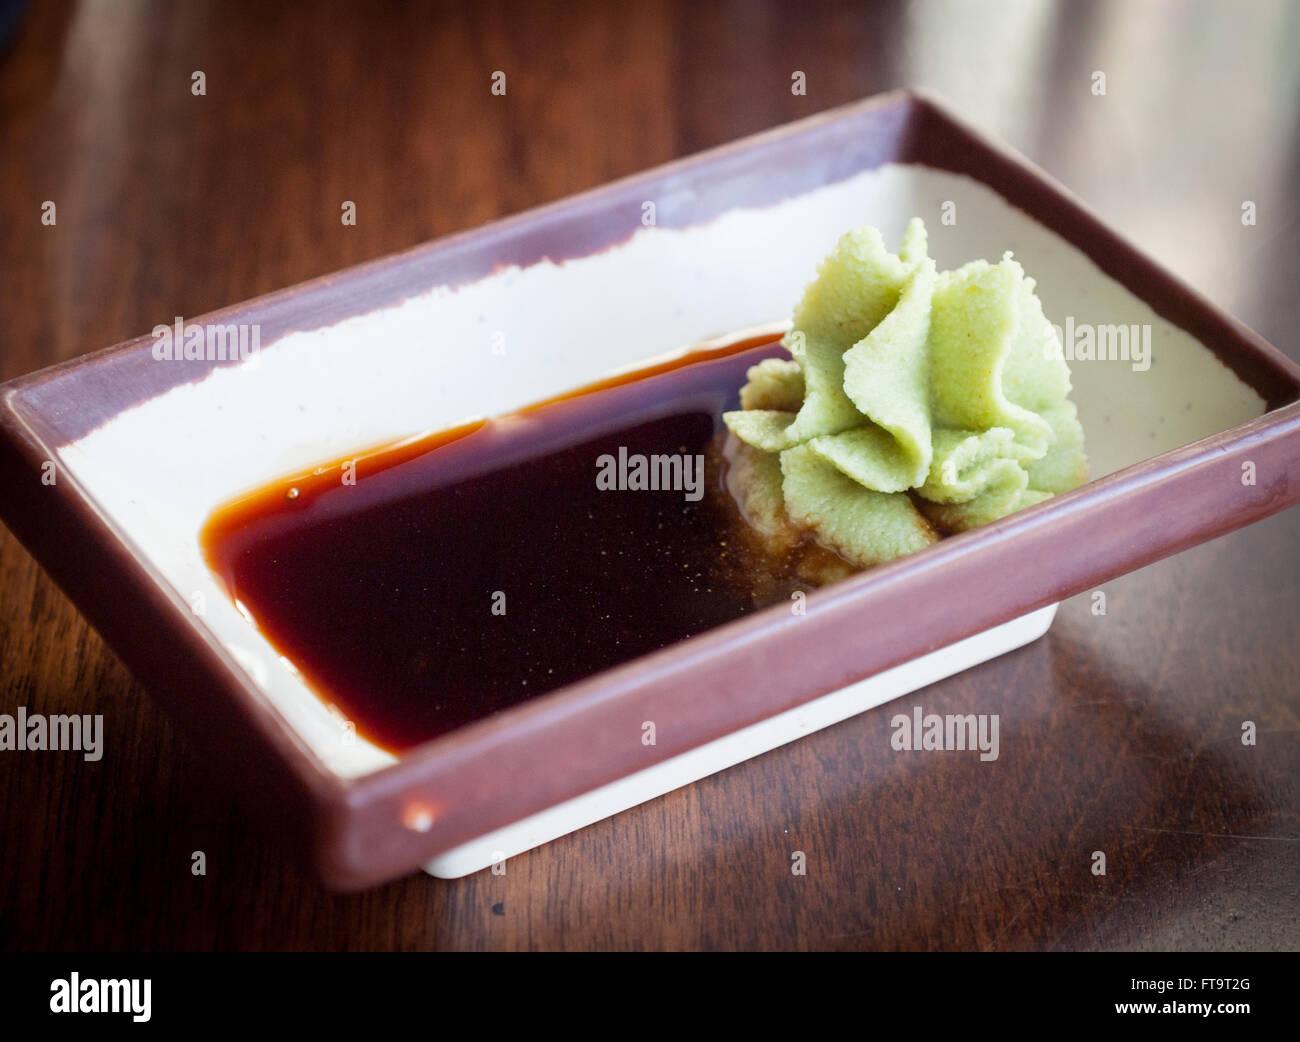 Imitation wasabi (seiyo-wasabi) paste and soy sauce. - Stock Image